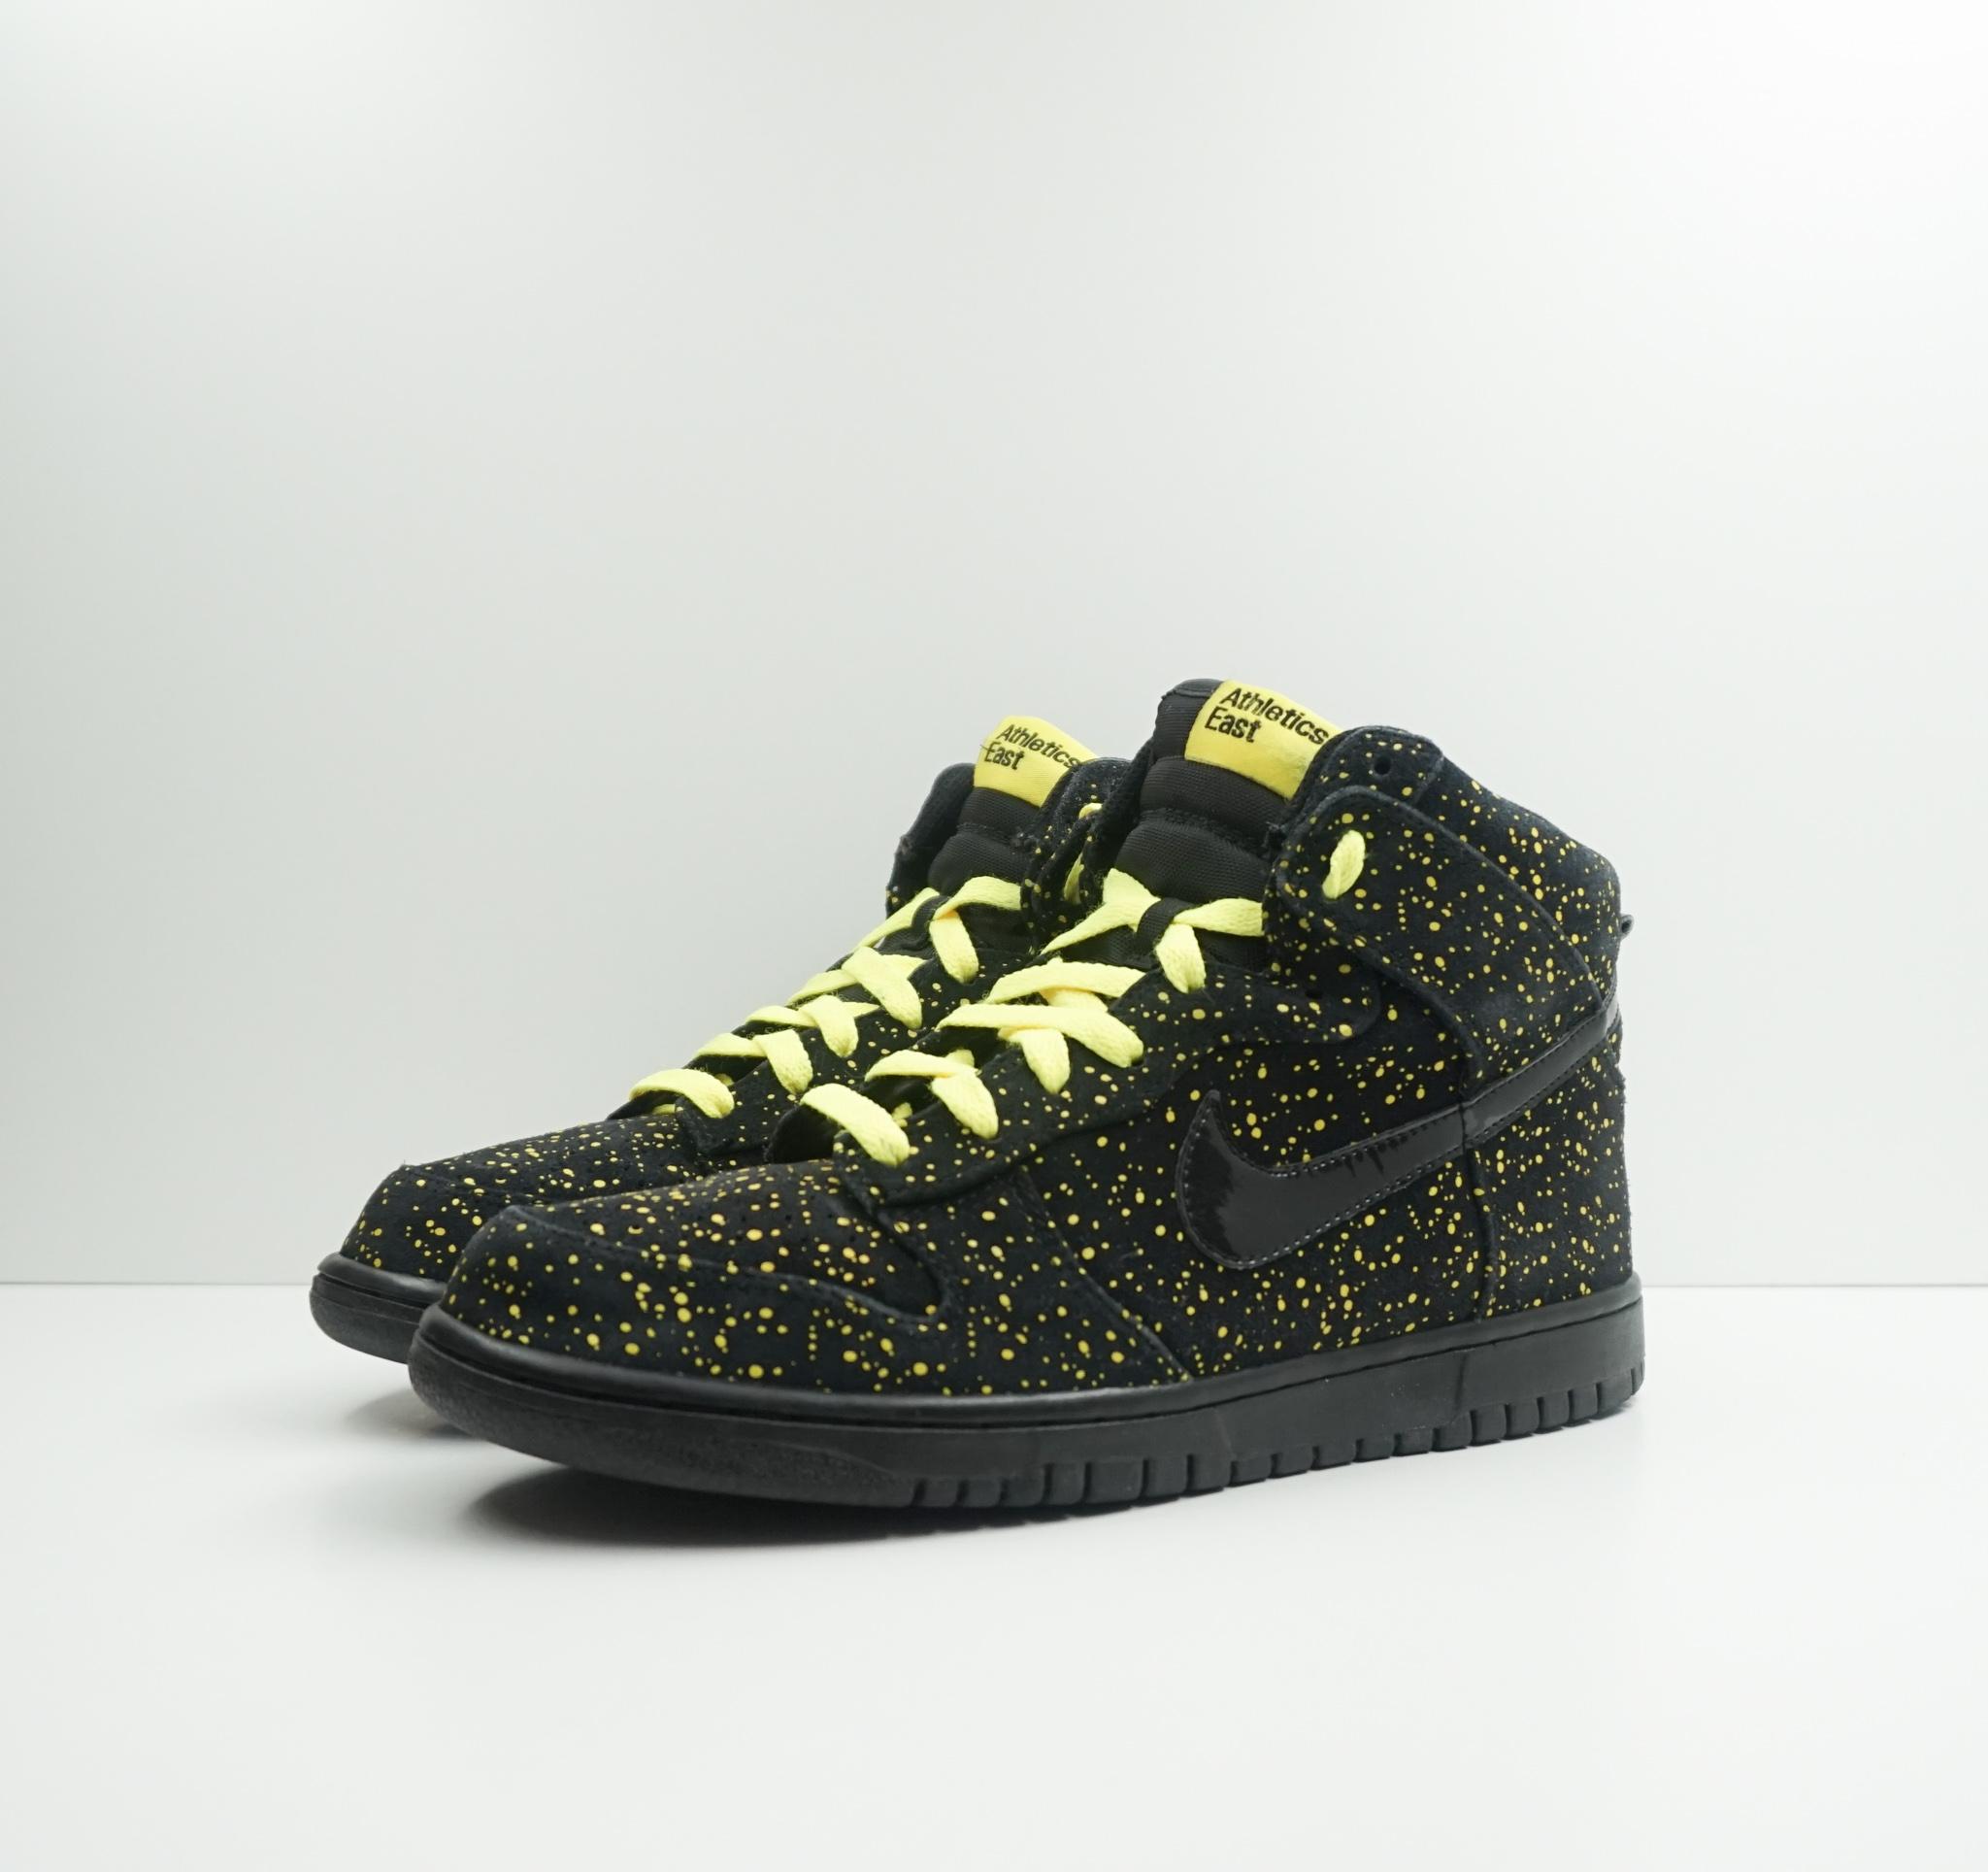 Nike Dunk High Premium Yellow Splatter